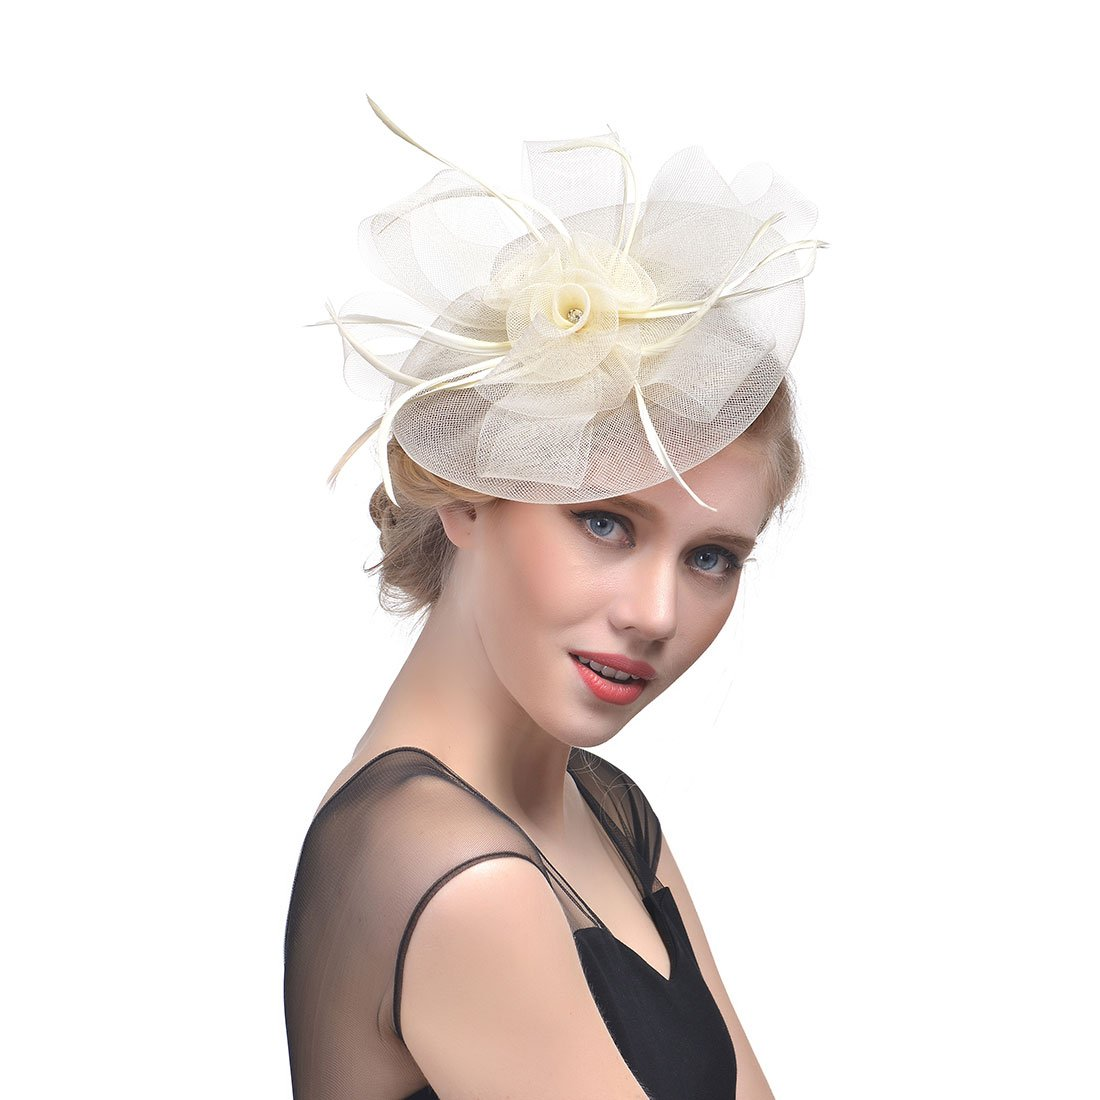 Women's Handmade Fascinator Cocktail Party Headpiece Feather Top Hat (Beige)